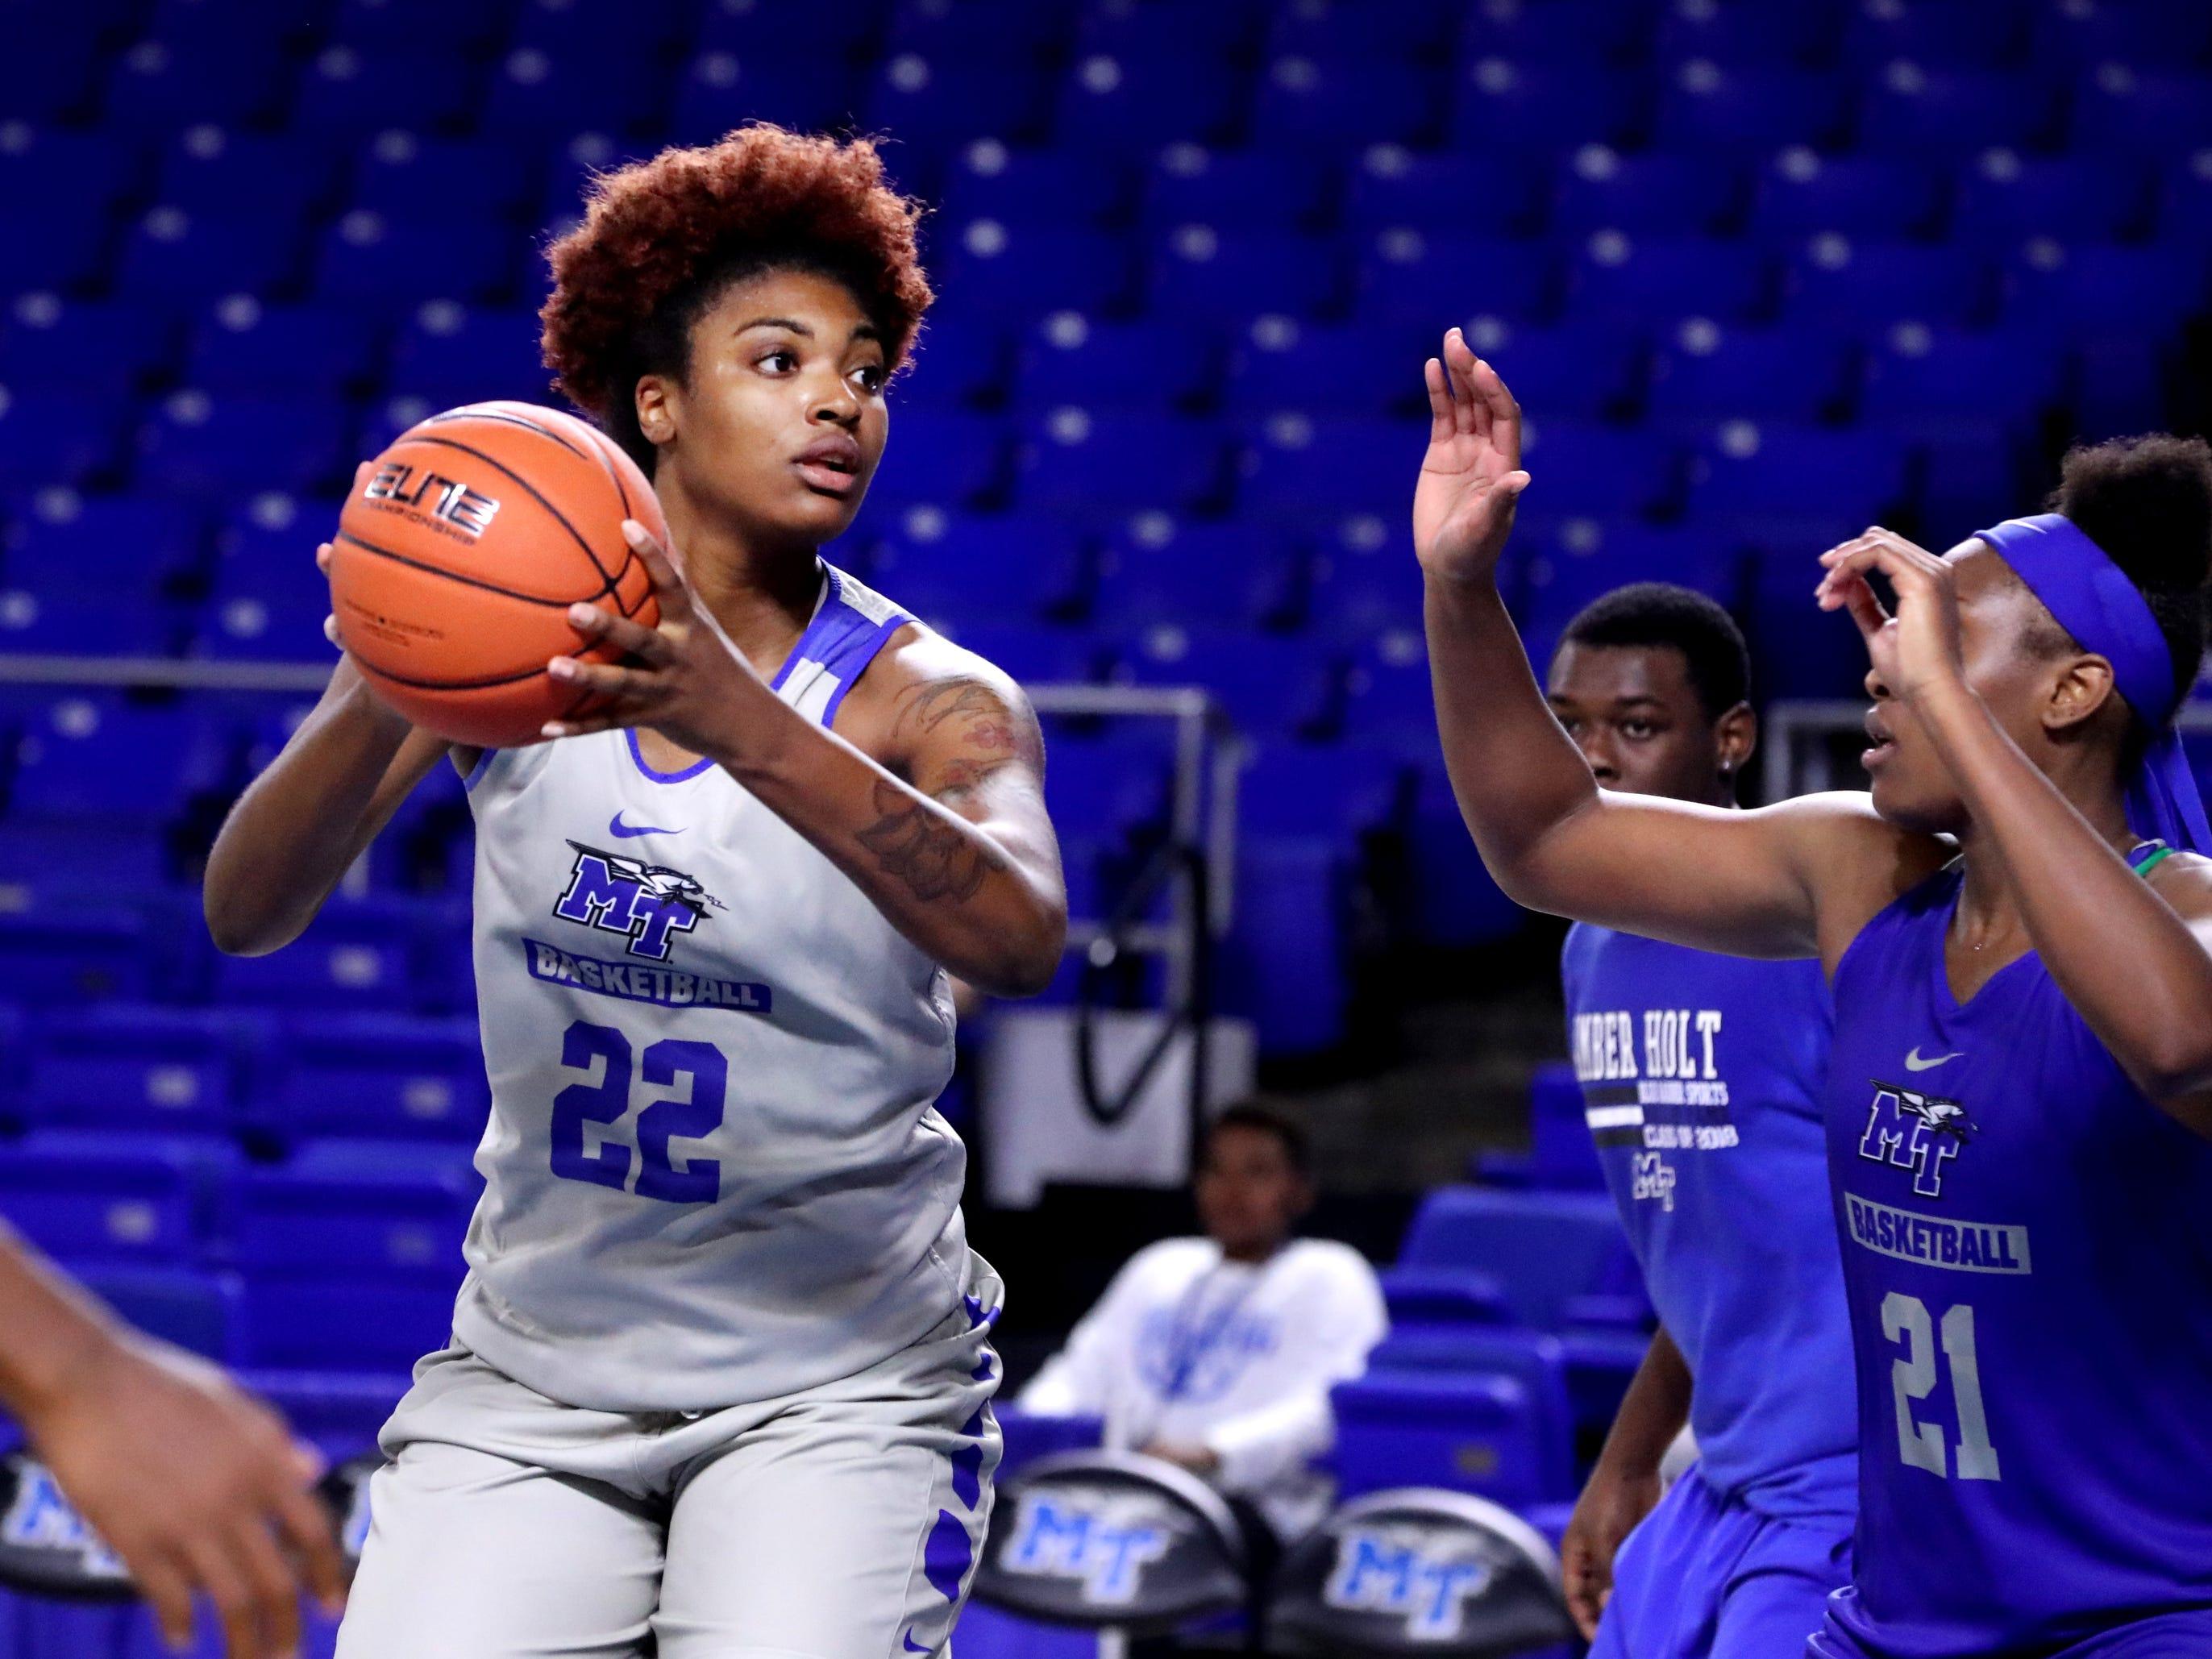 MTSU's Ra'Shika White (22) looks to pass or shoot during MTSU women's basketball team practice at Murphy Center on Monday, Nov.. 5, 2018.